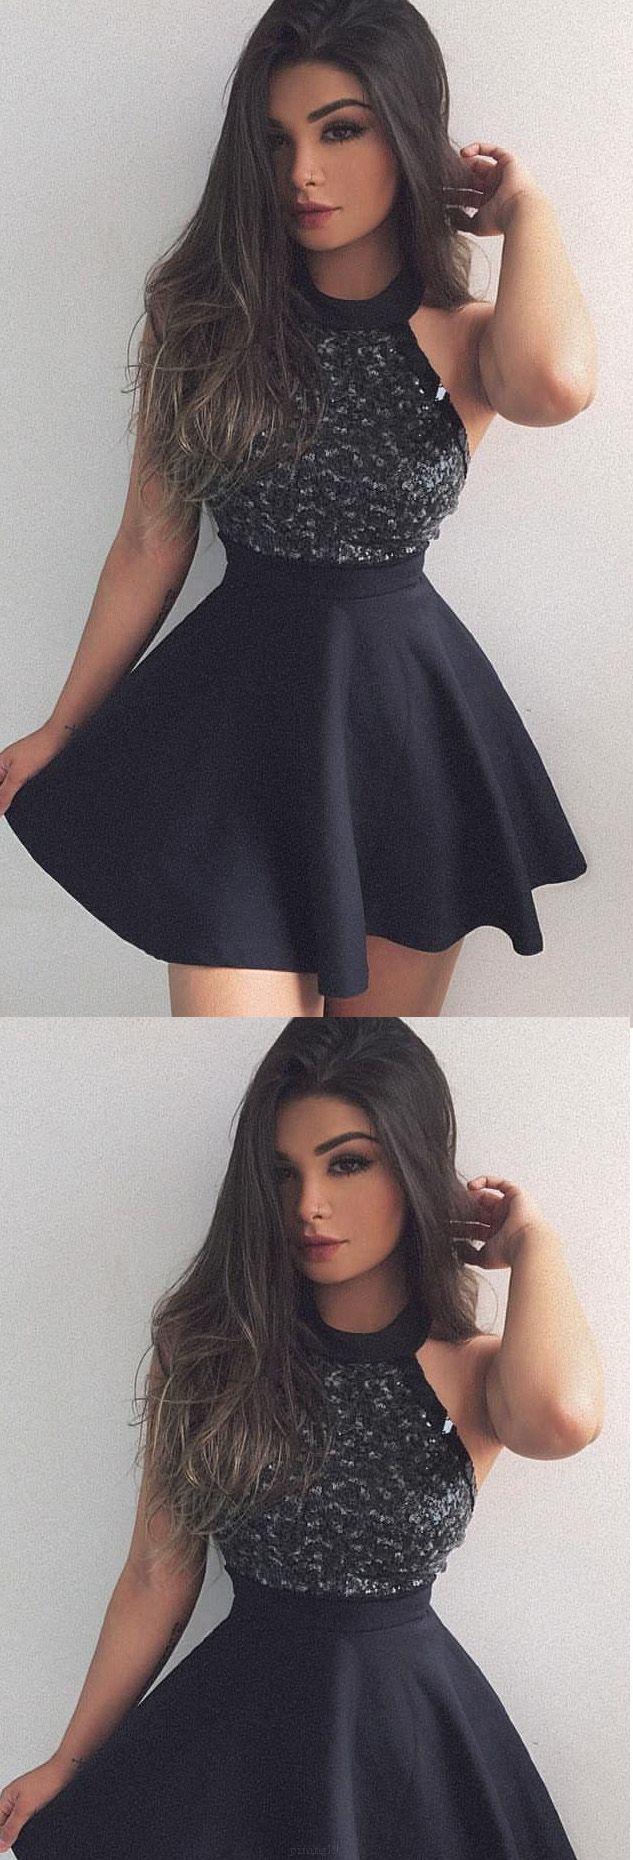 Short prom dresses black prom dresses prom dresses short short